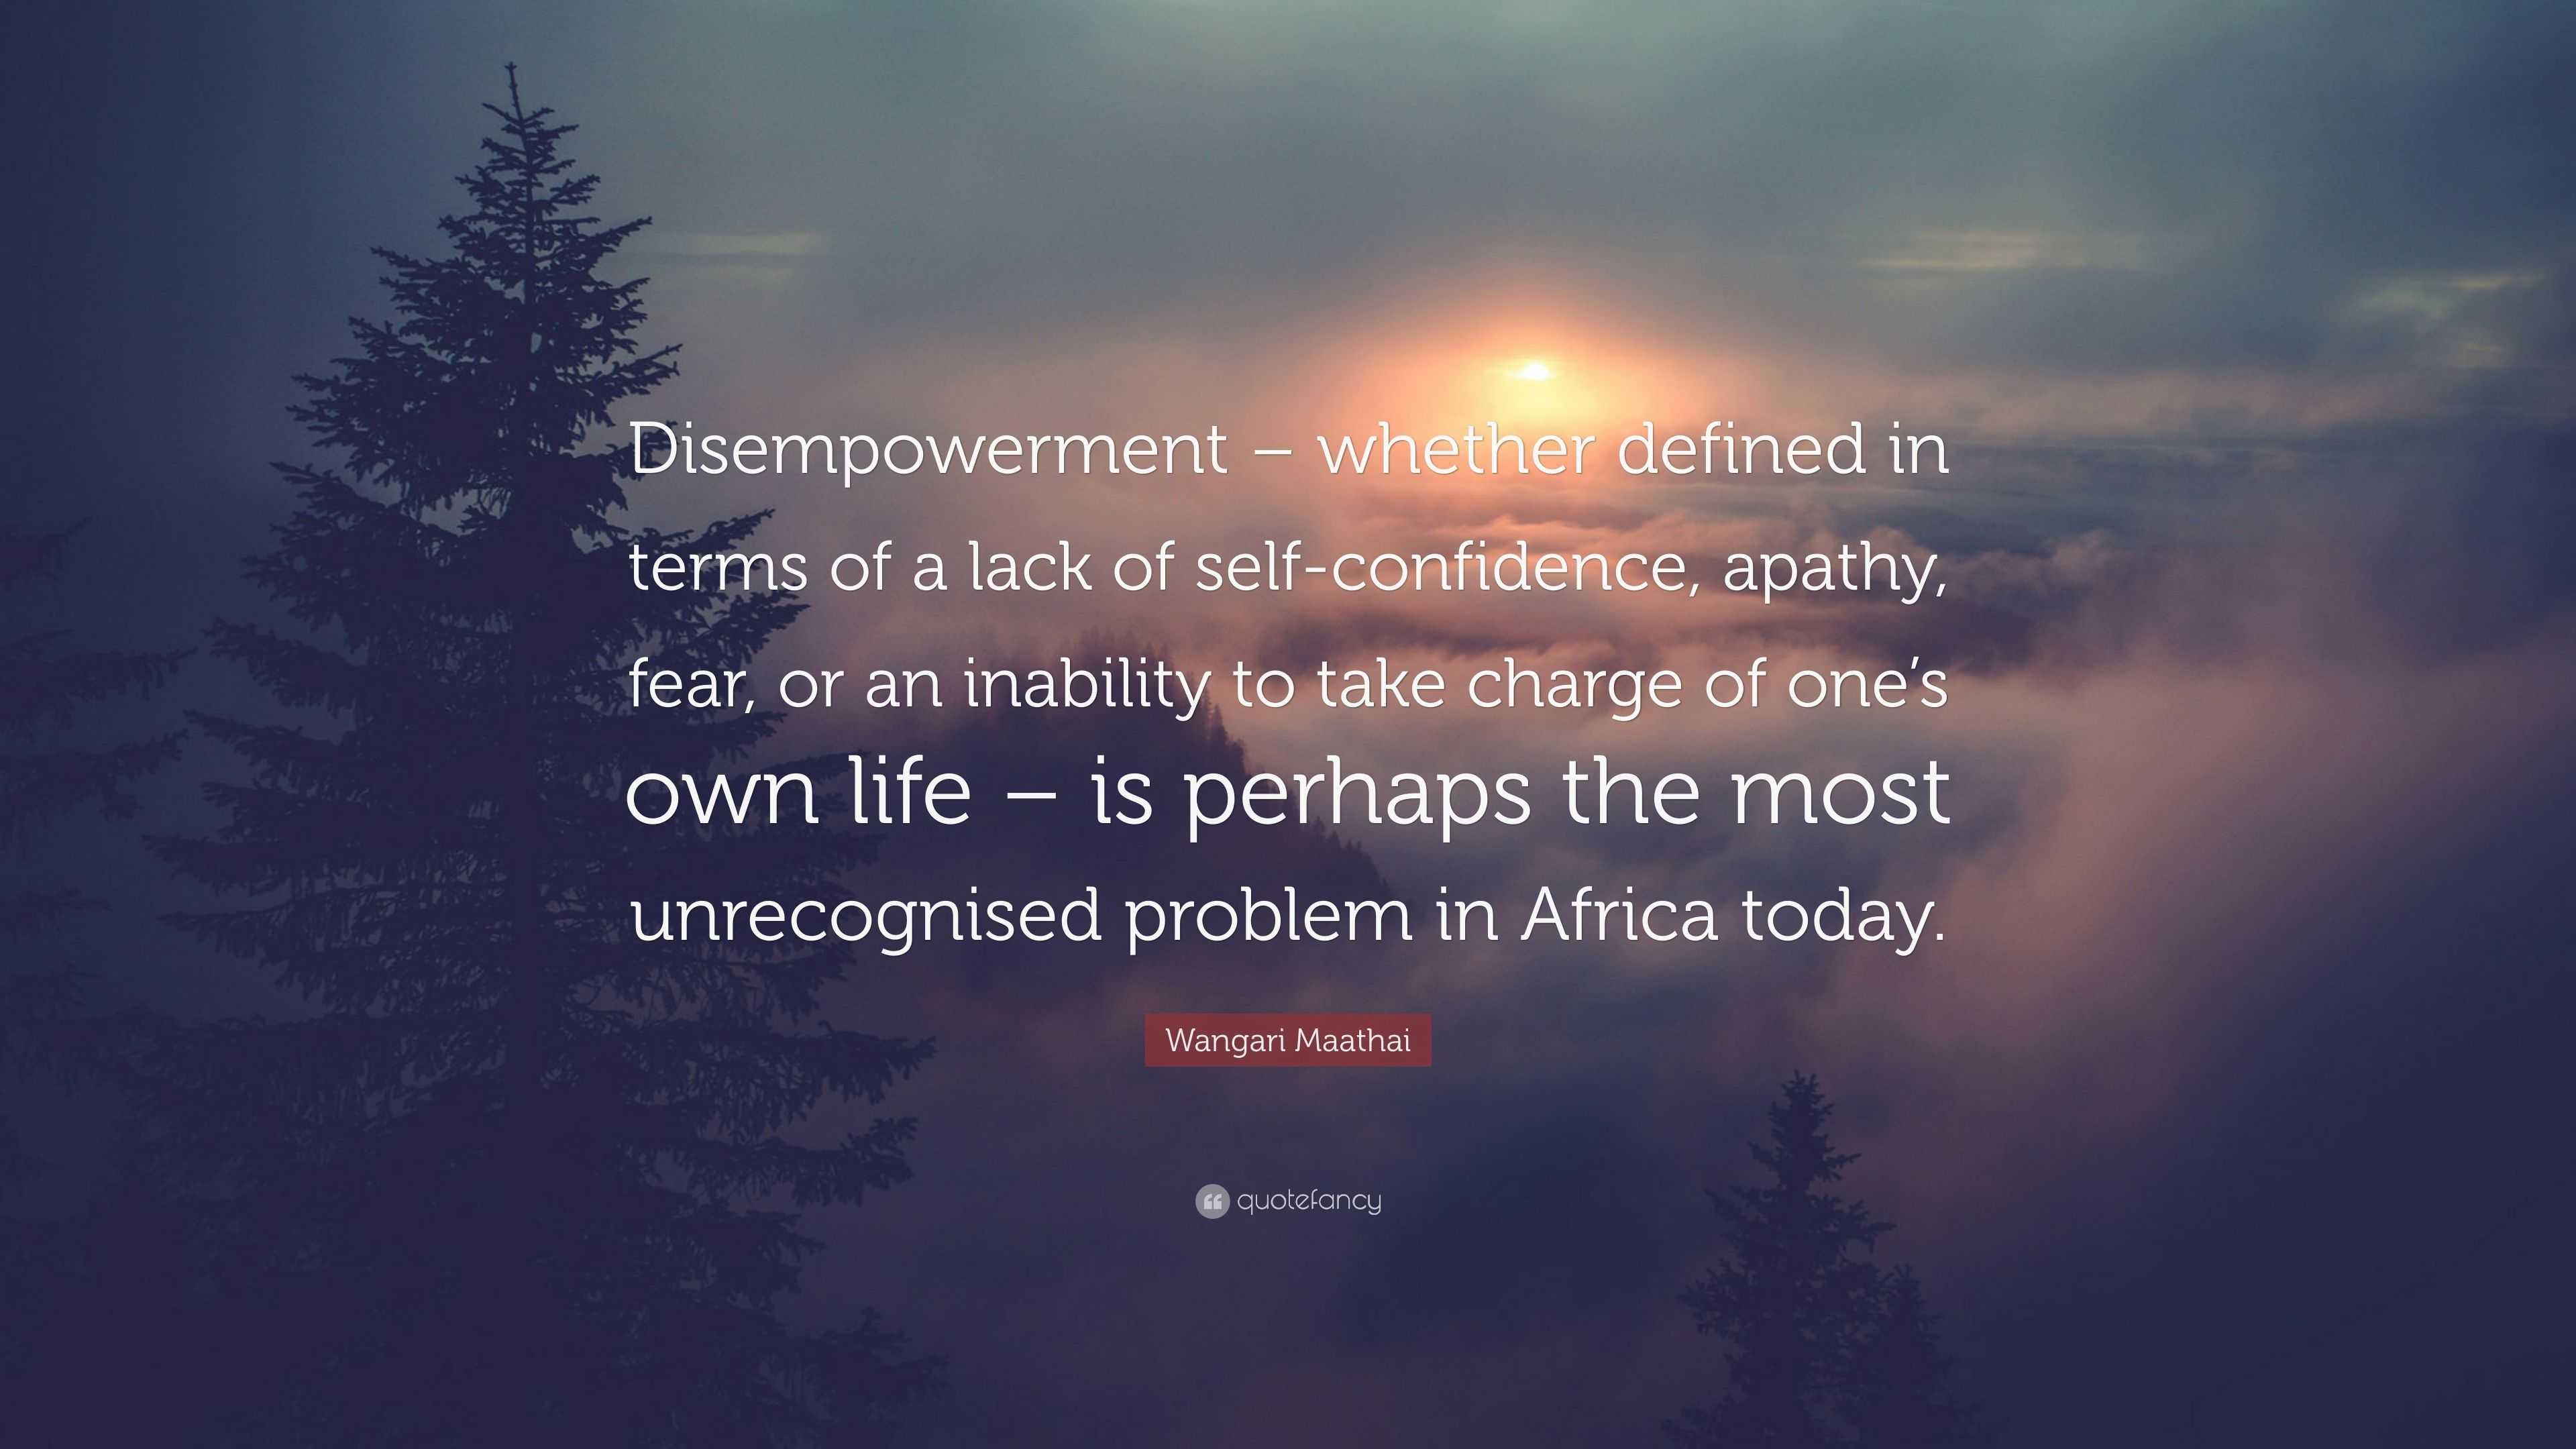 define disempowerment